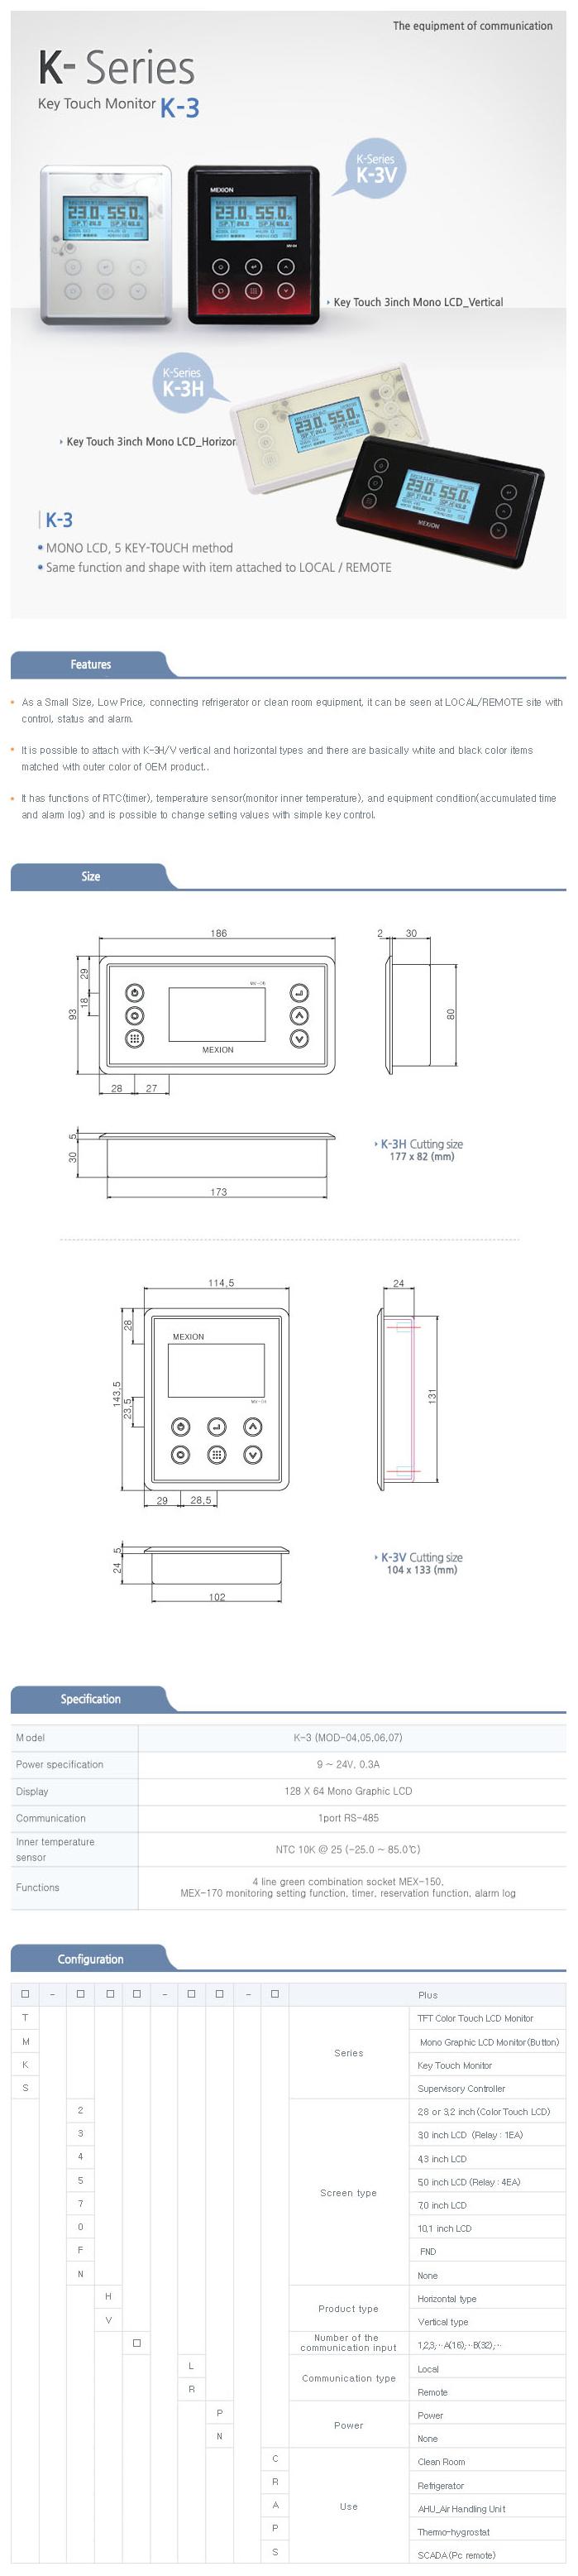 MST Key Touch Monitor (K-3) K-Series